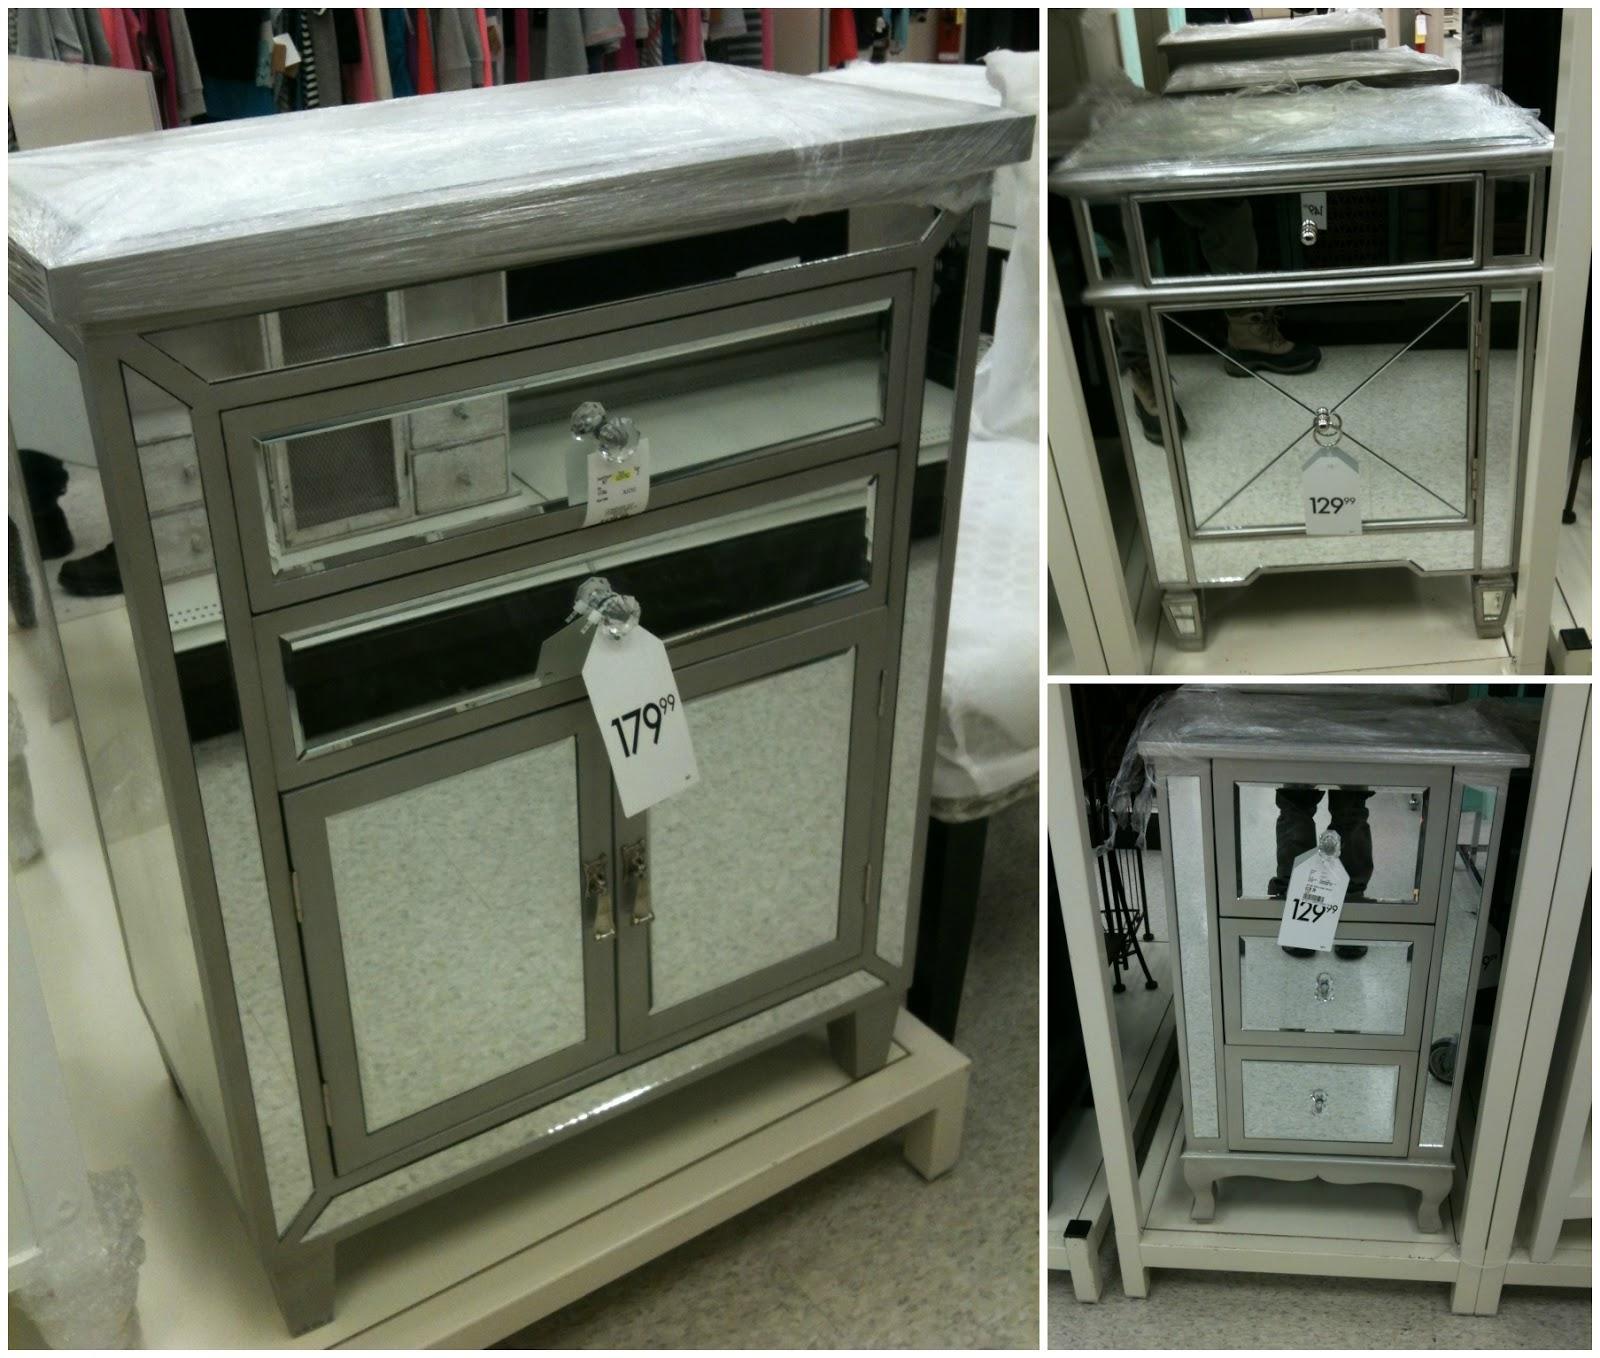 miroir miroir nana toulouse. Black Bedroom Furniture Sets. Home Design Ideas